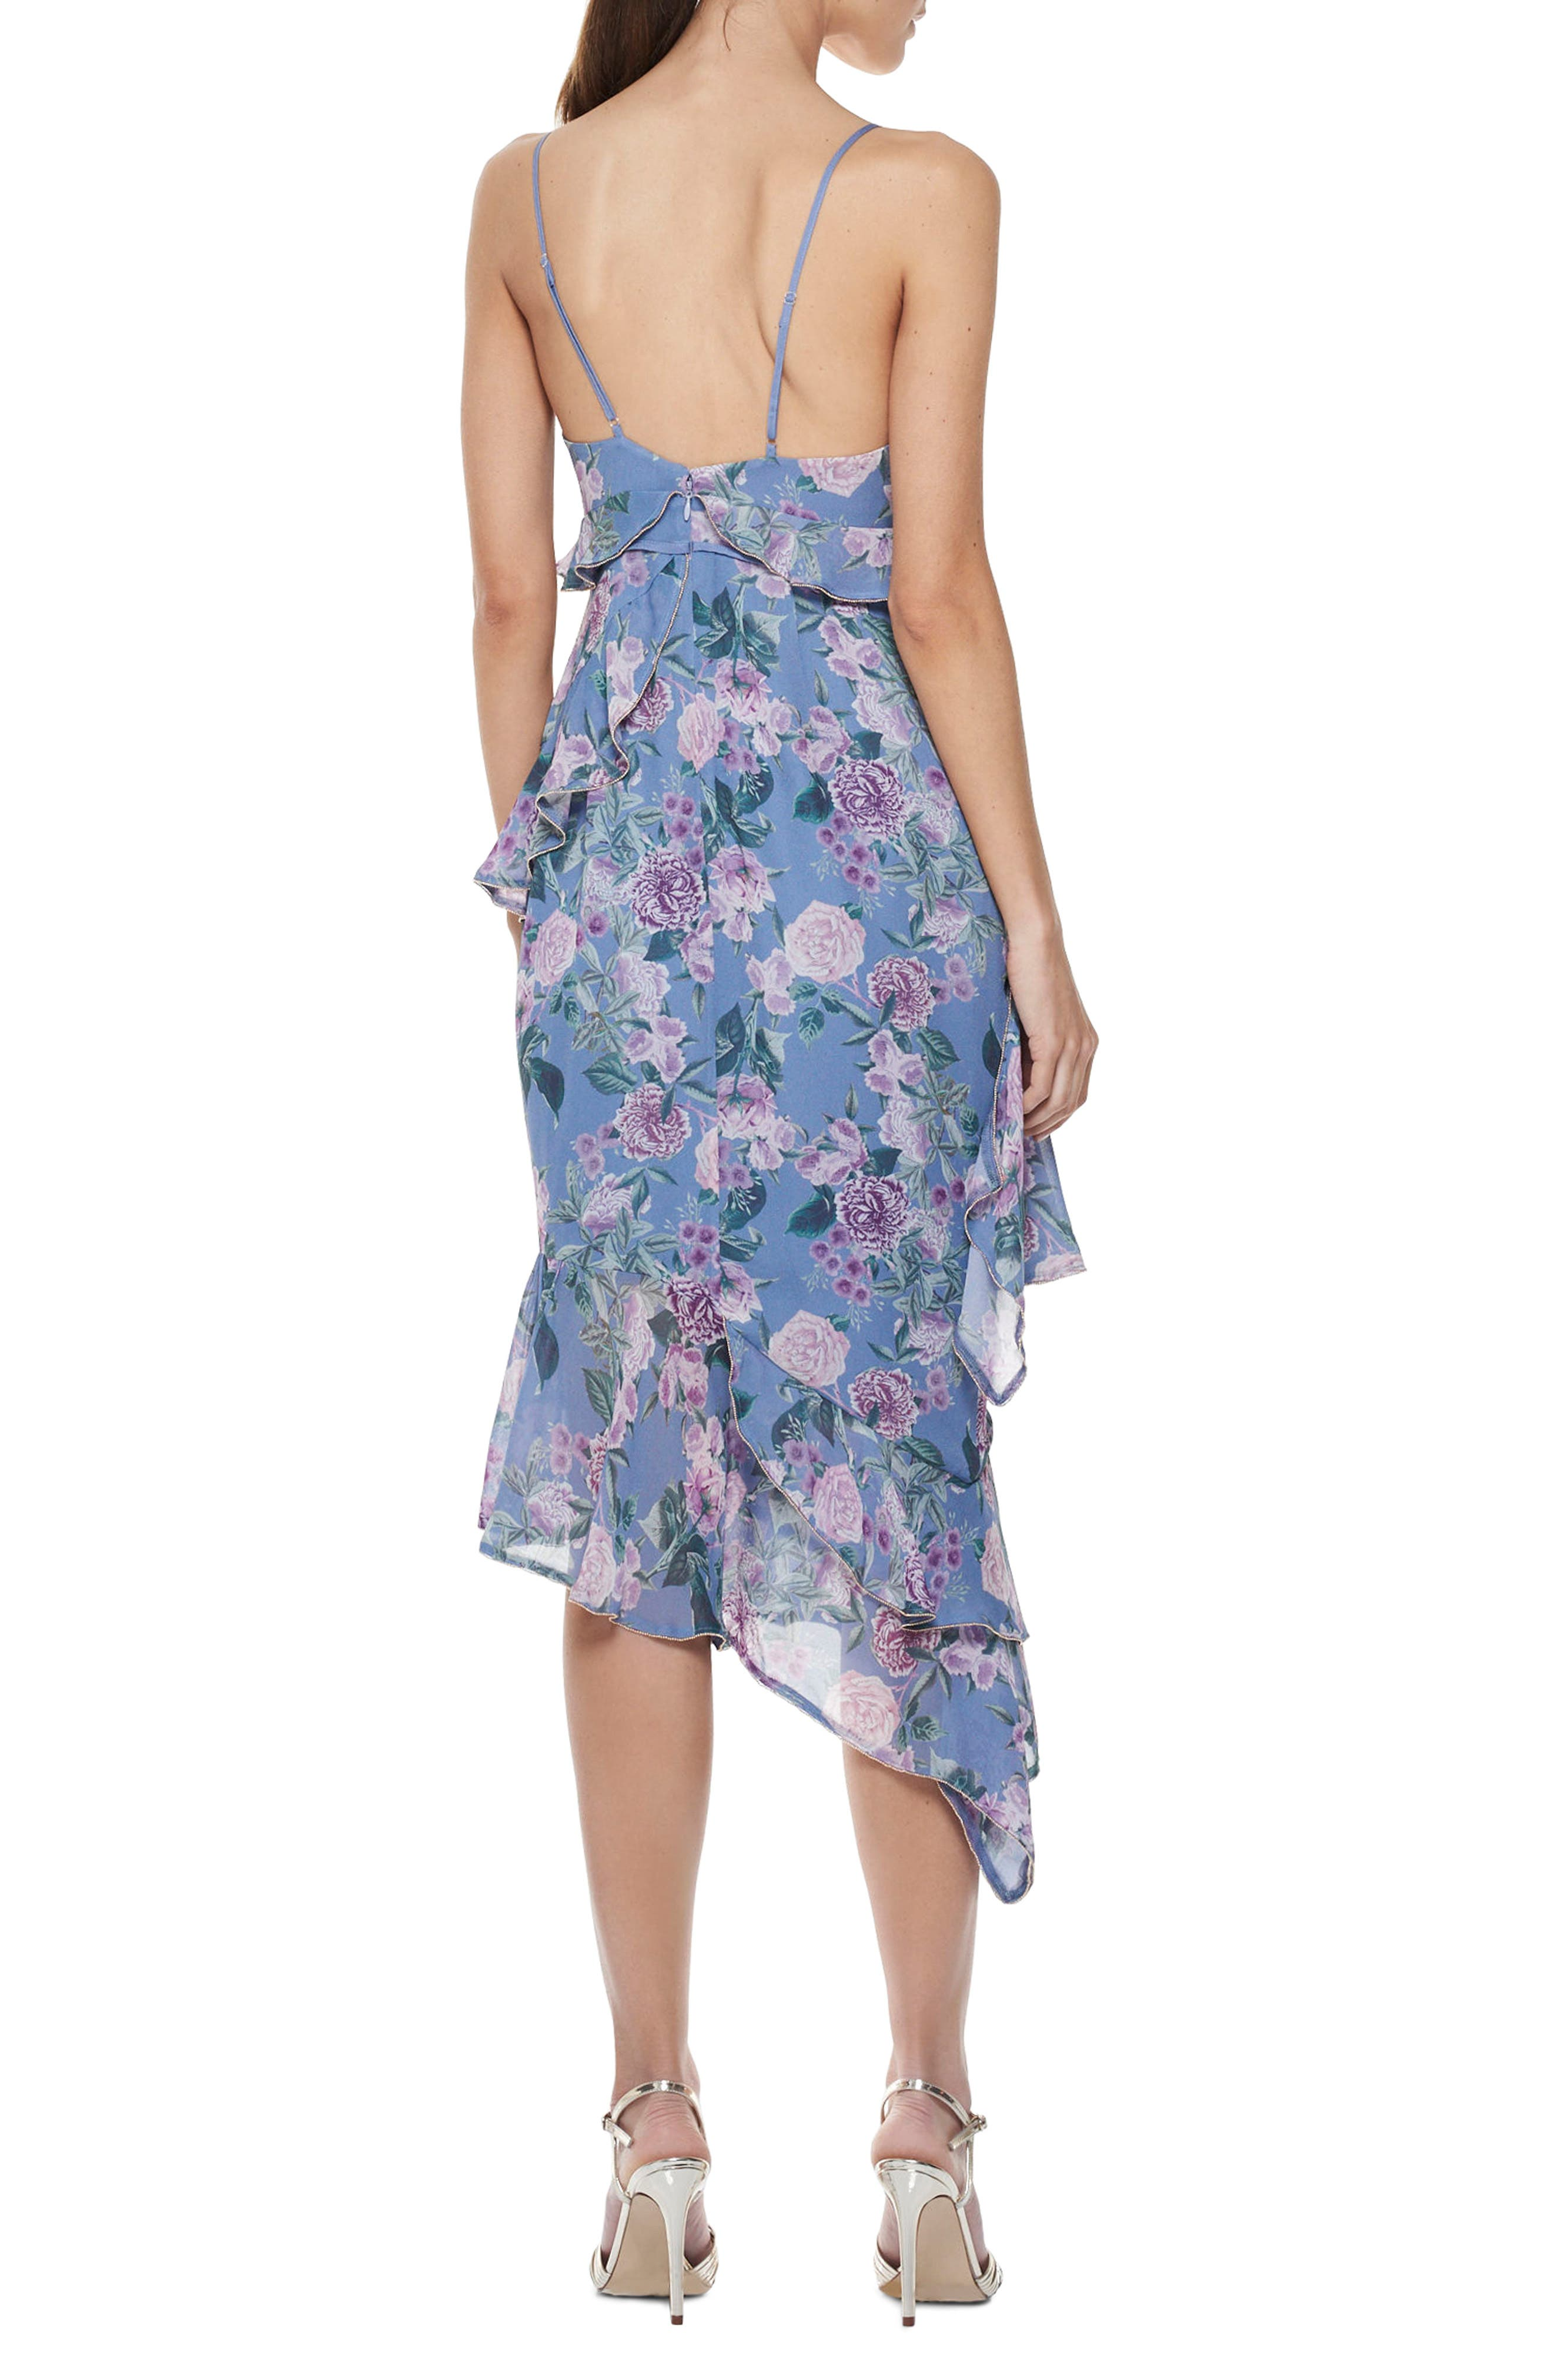 Here & Now Asymmetric Midi Dress,                             Alternate thumbnail 2, color,                             Print